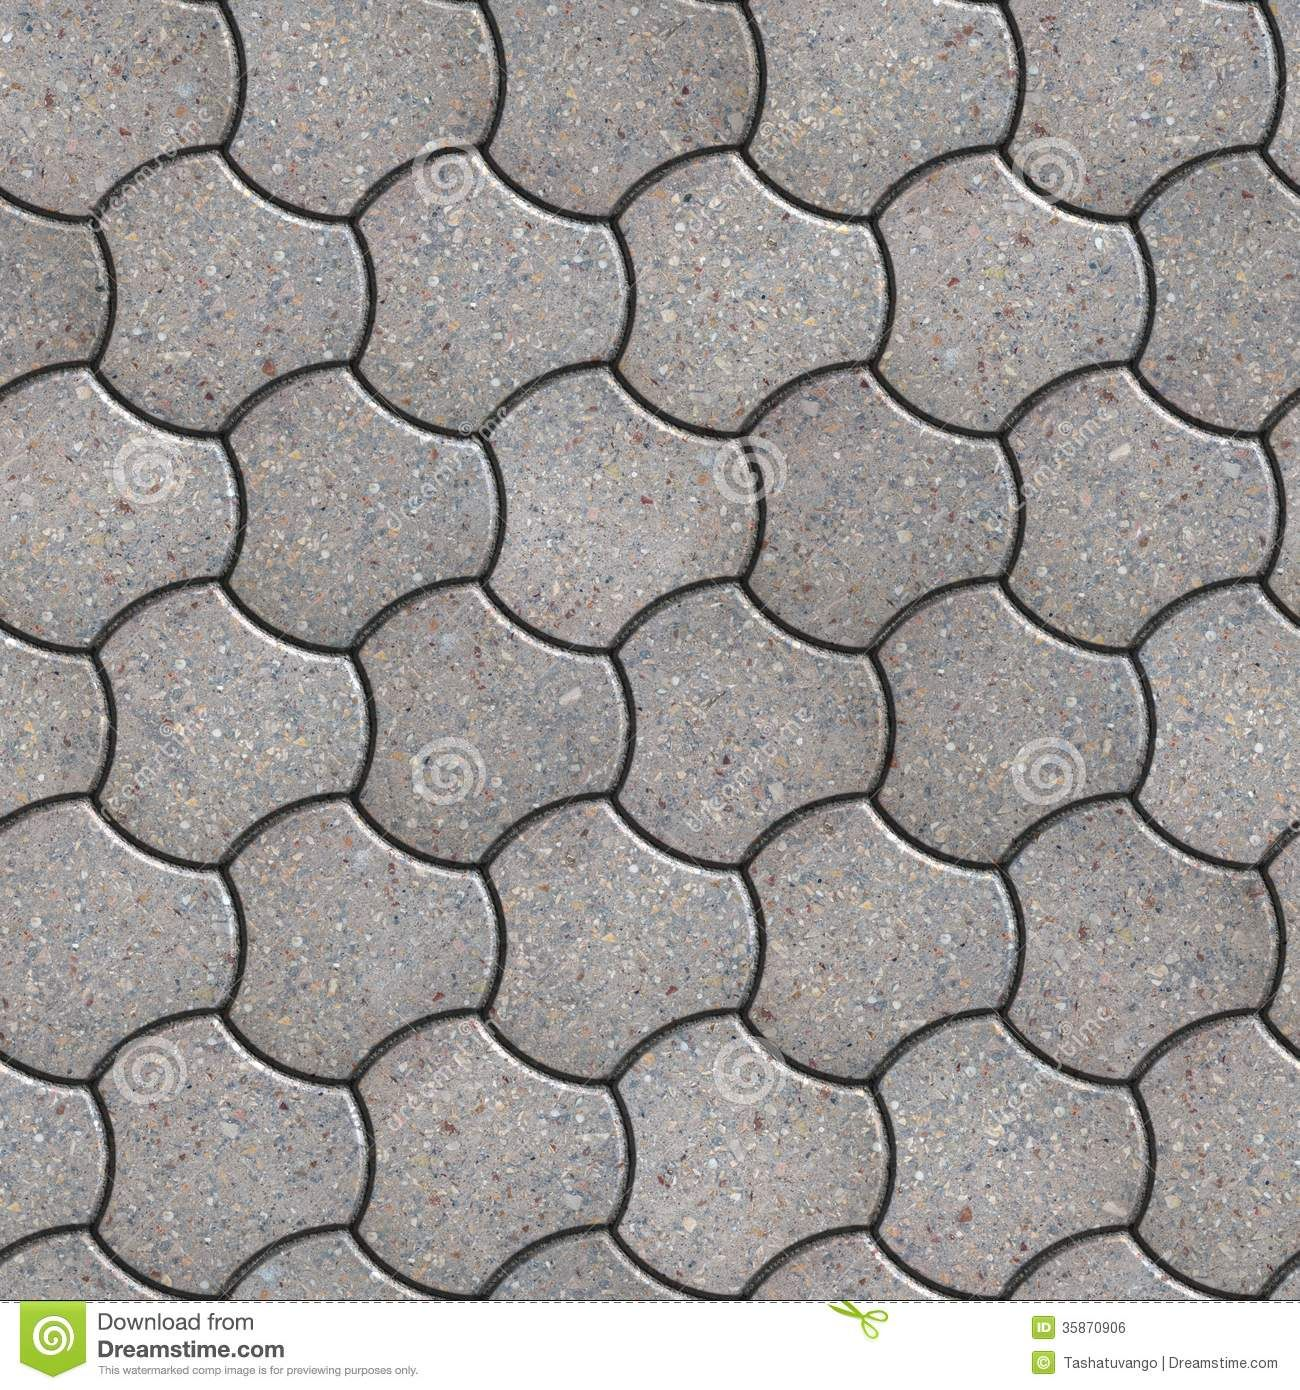 Garden Paving Stone Texture Paving Slabs Little Like Dragon